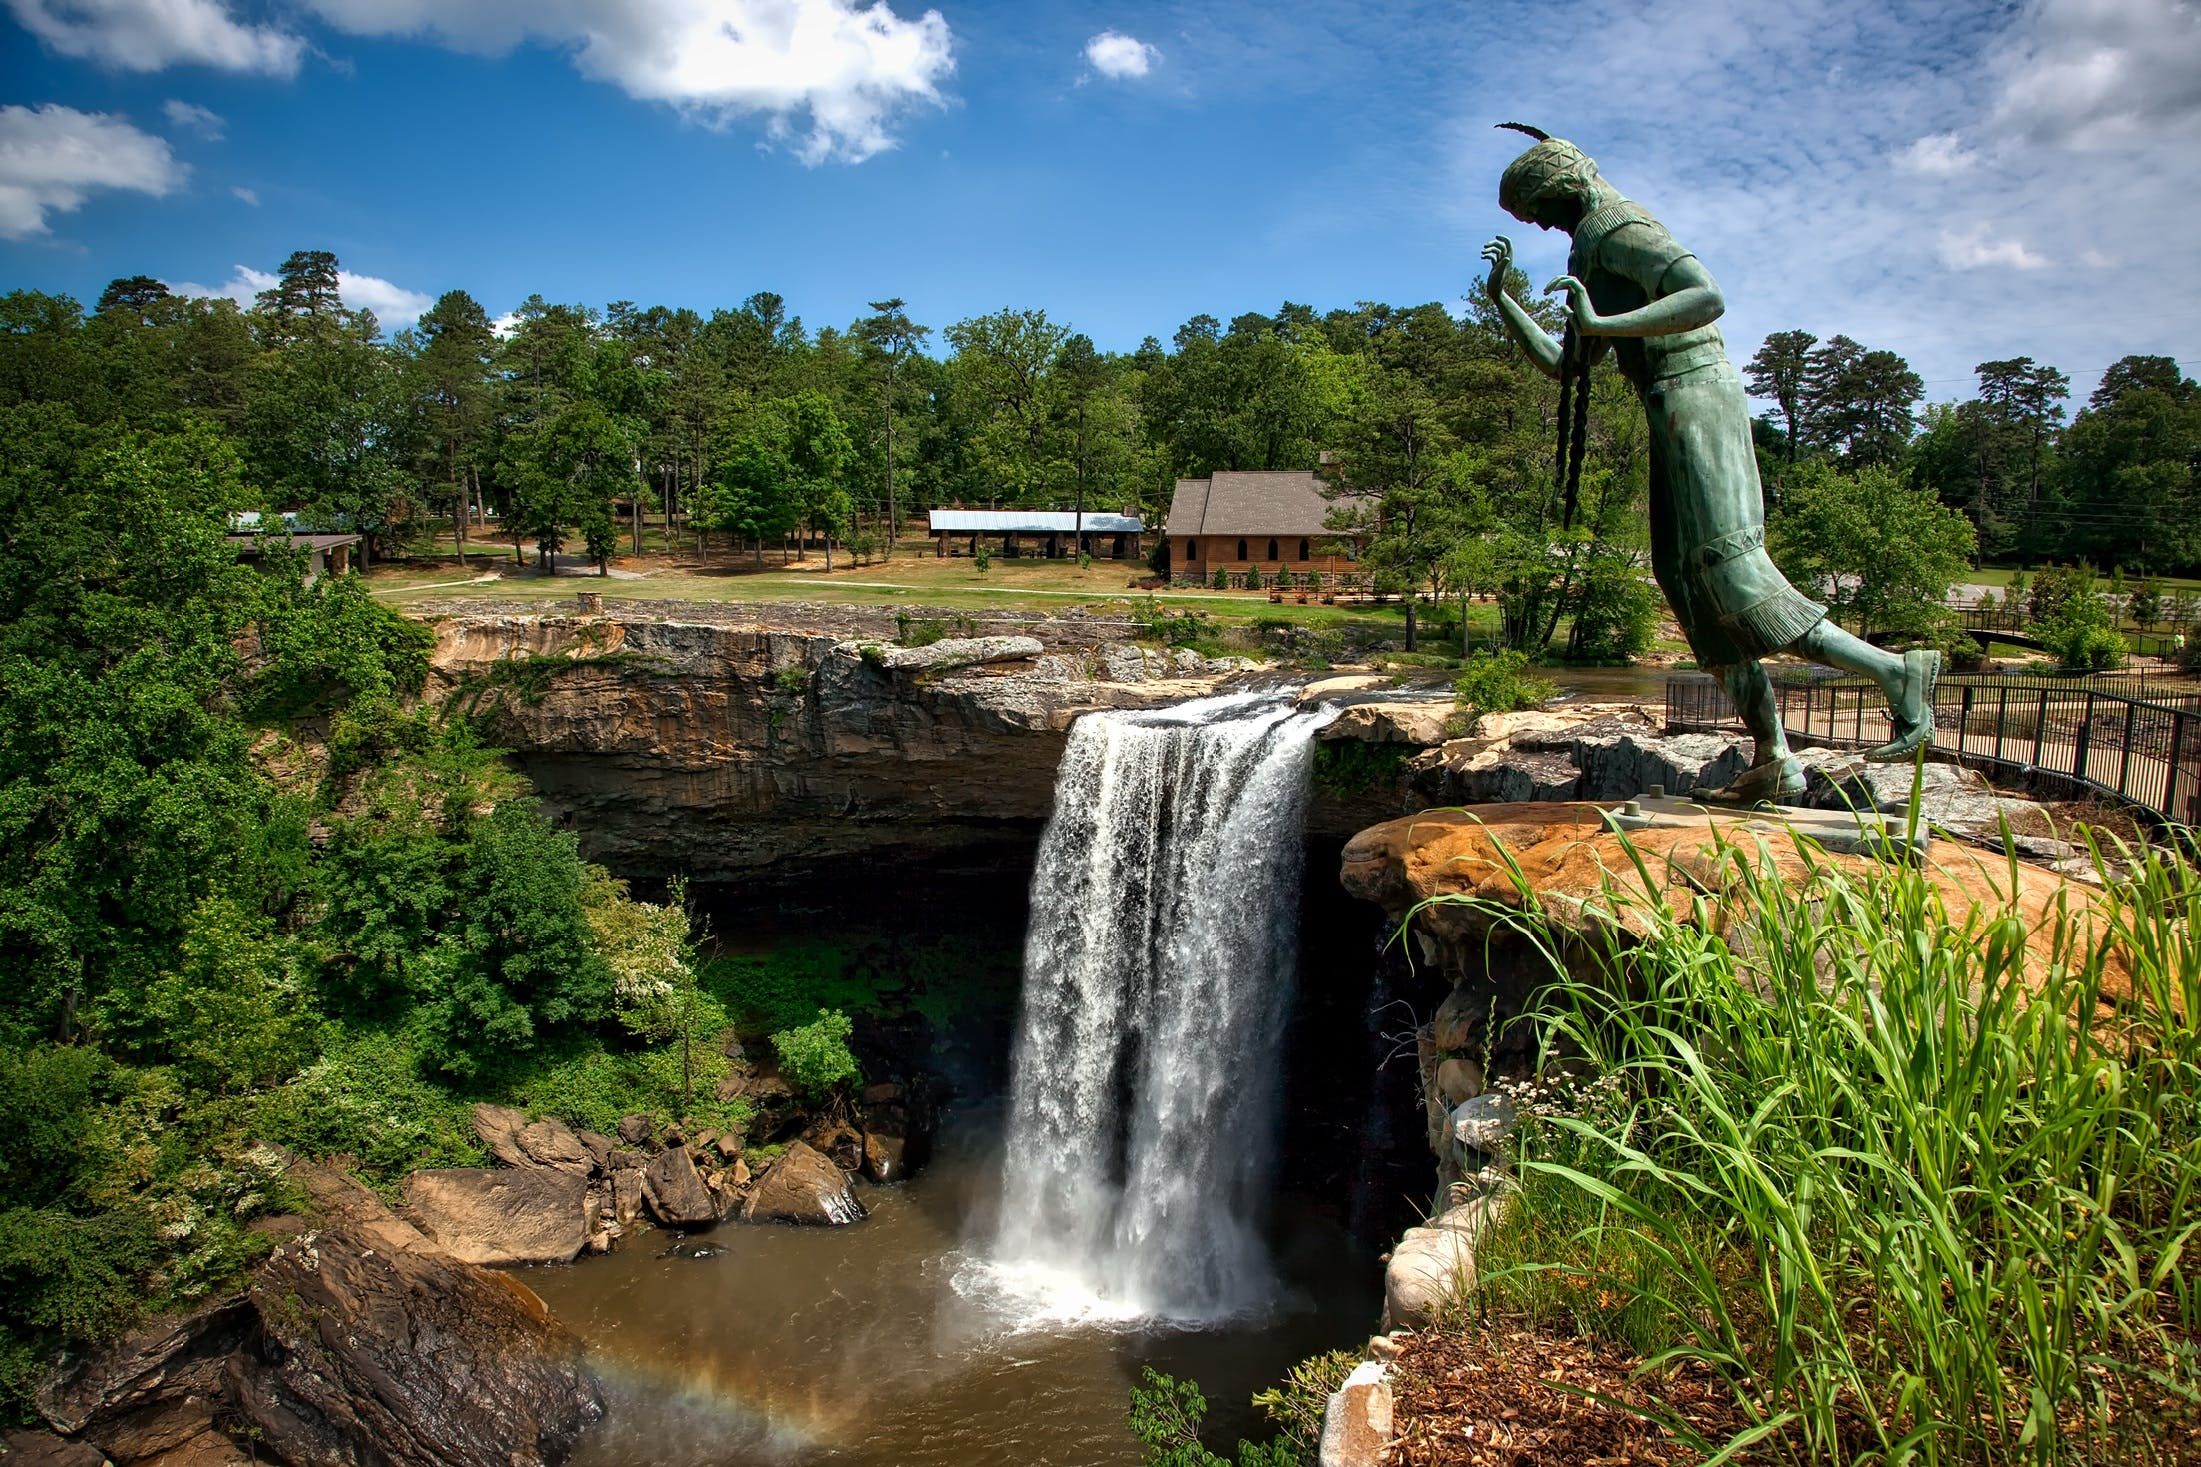 Waterfall Near Green Trees